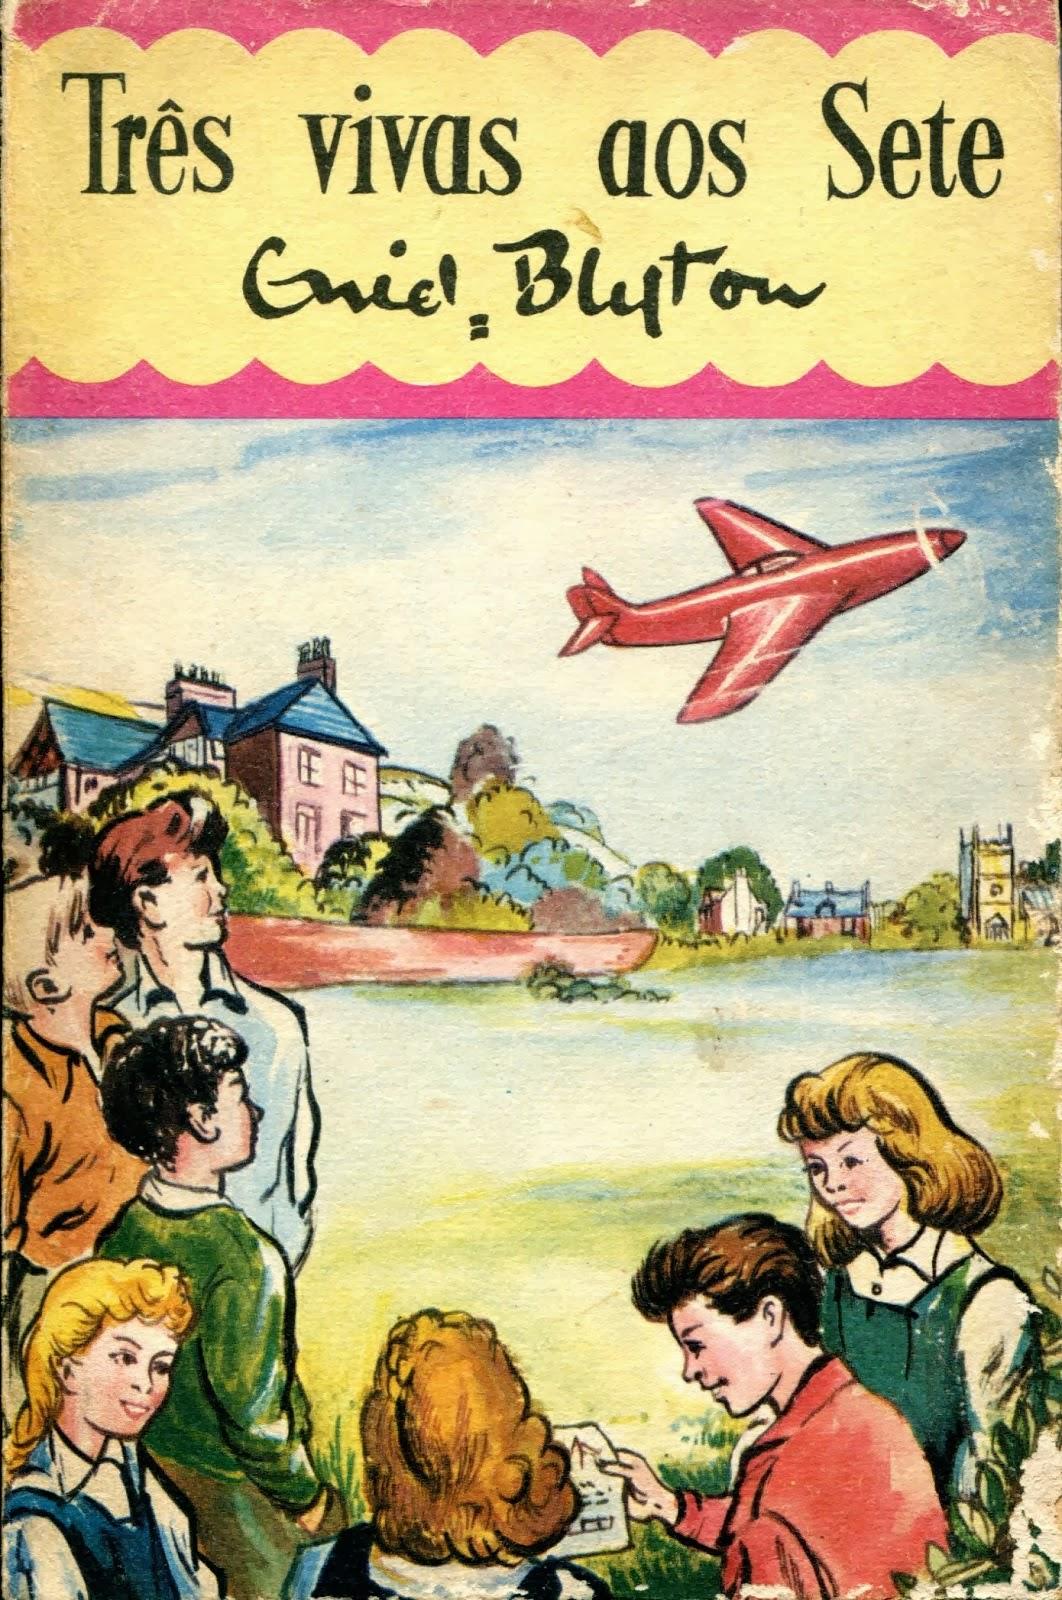 Livros da Enid Blyton!